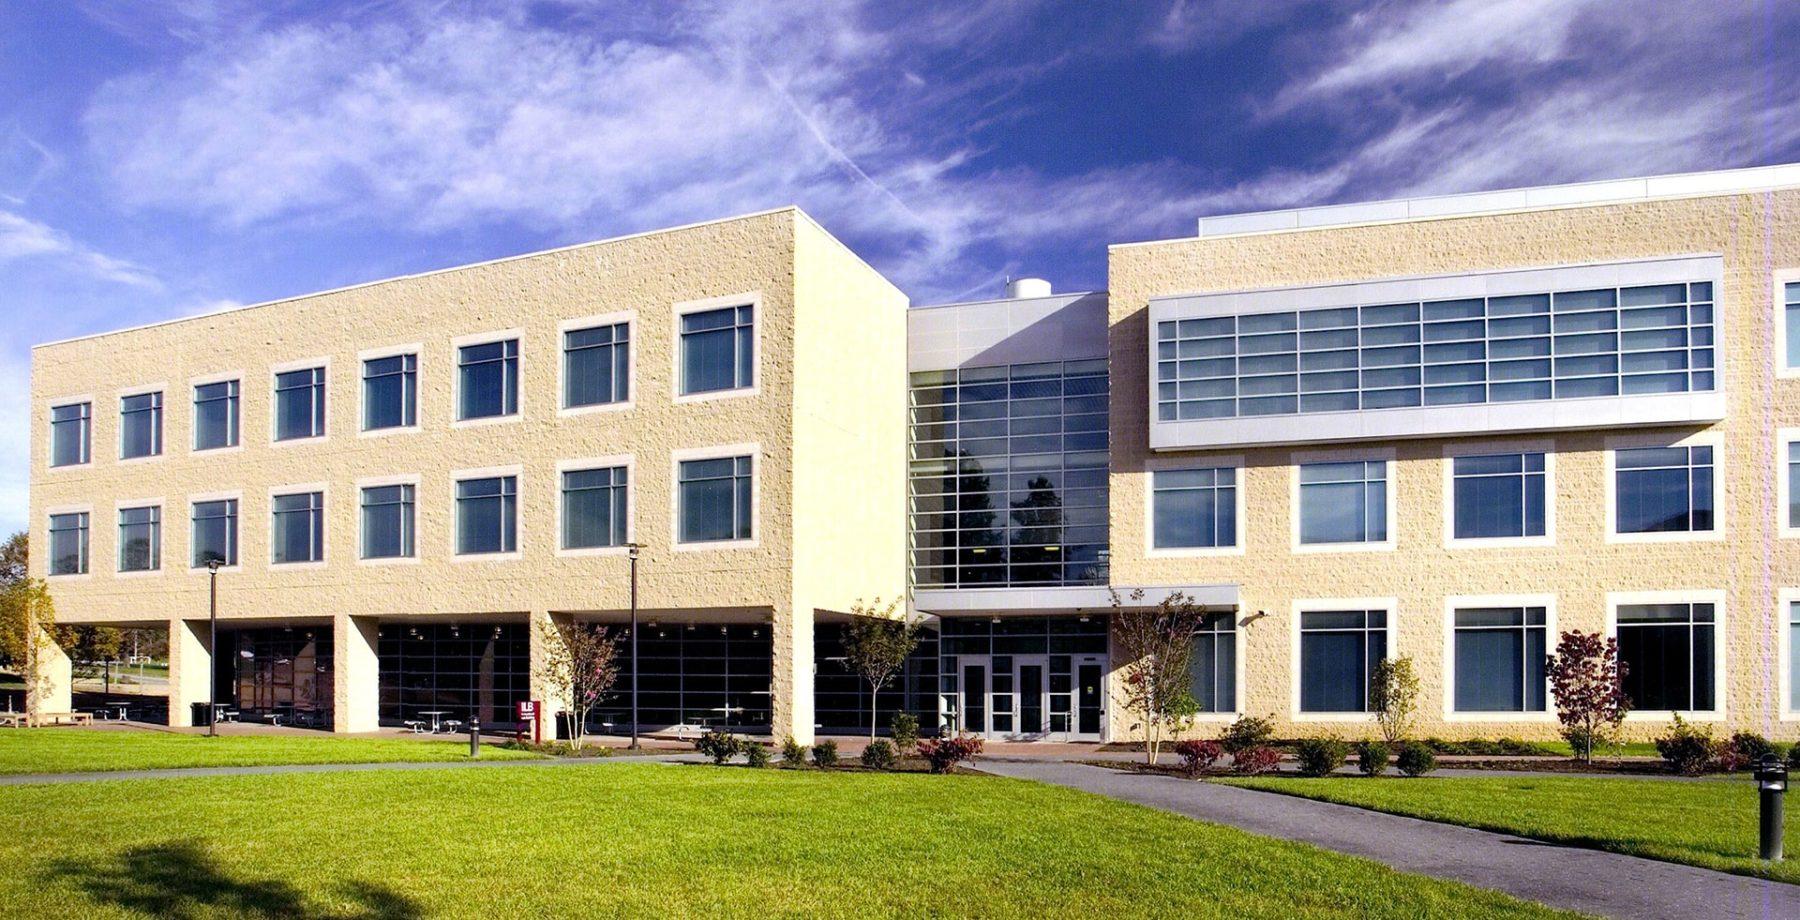 Howard Community College English Language Business Building